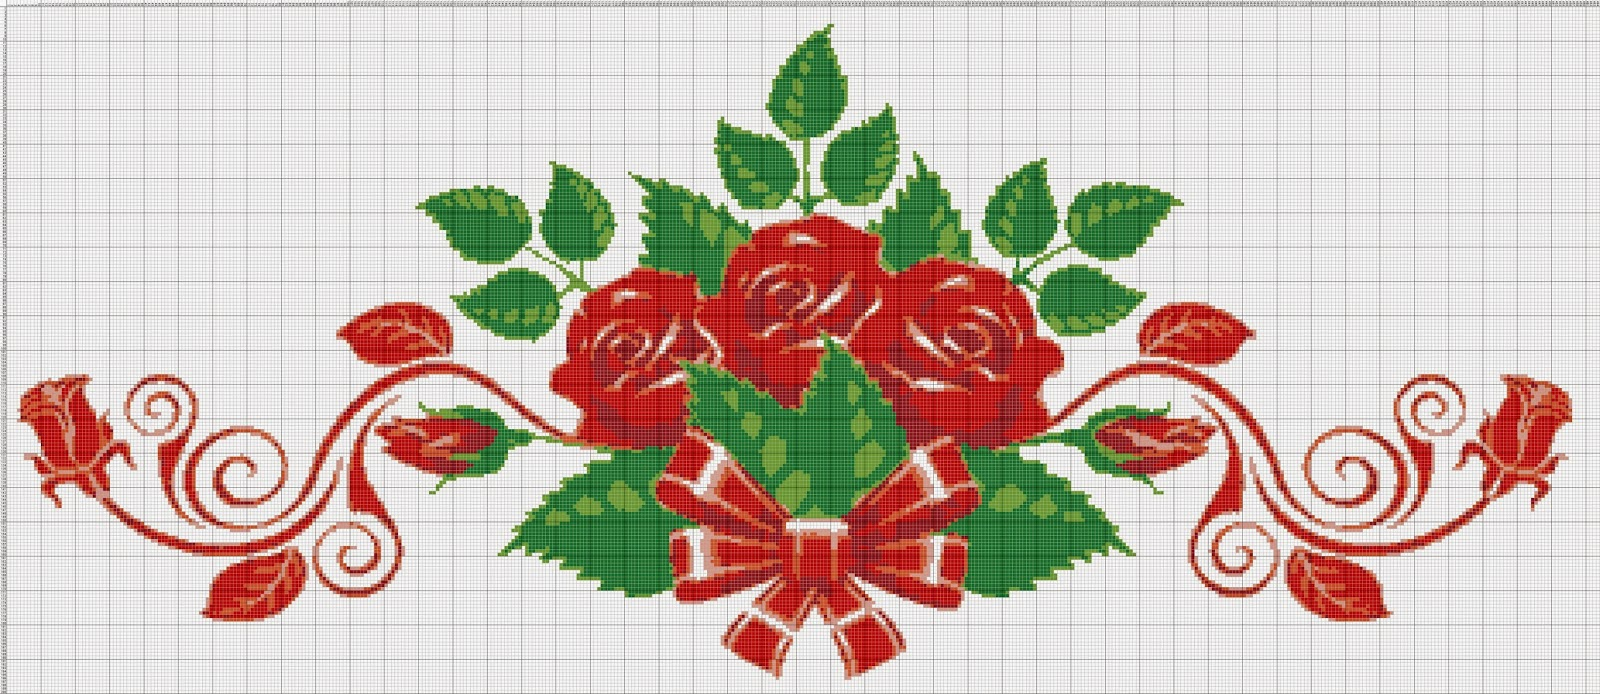 Gambar Pola Kristik Bunga Mawar Merah (3)